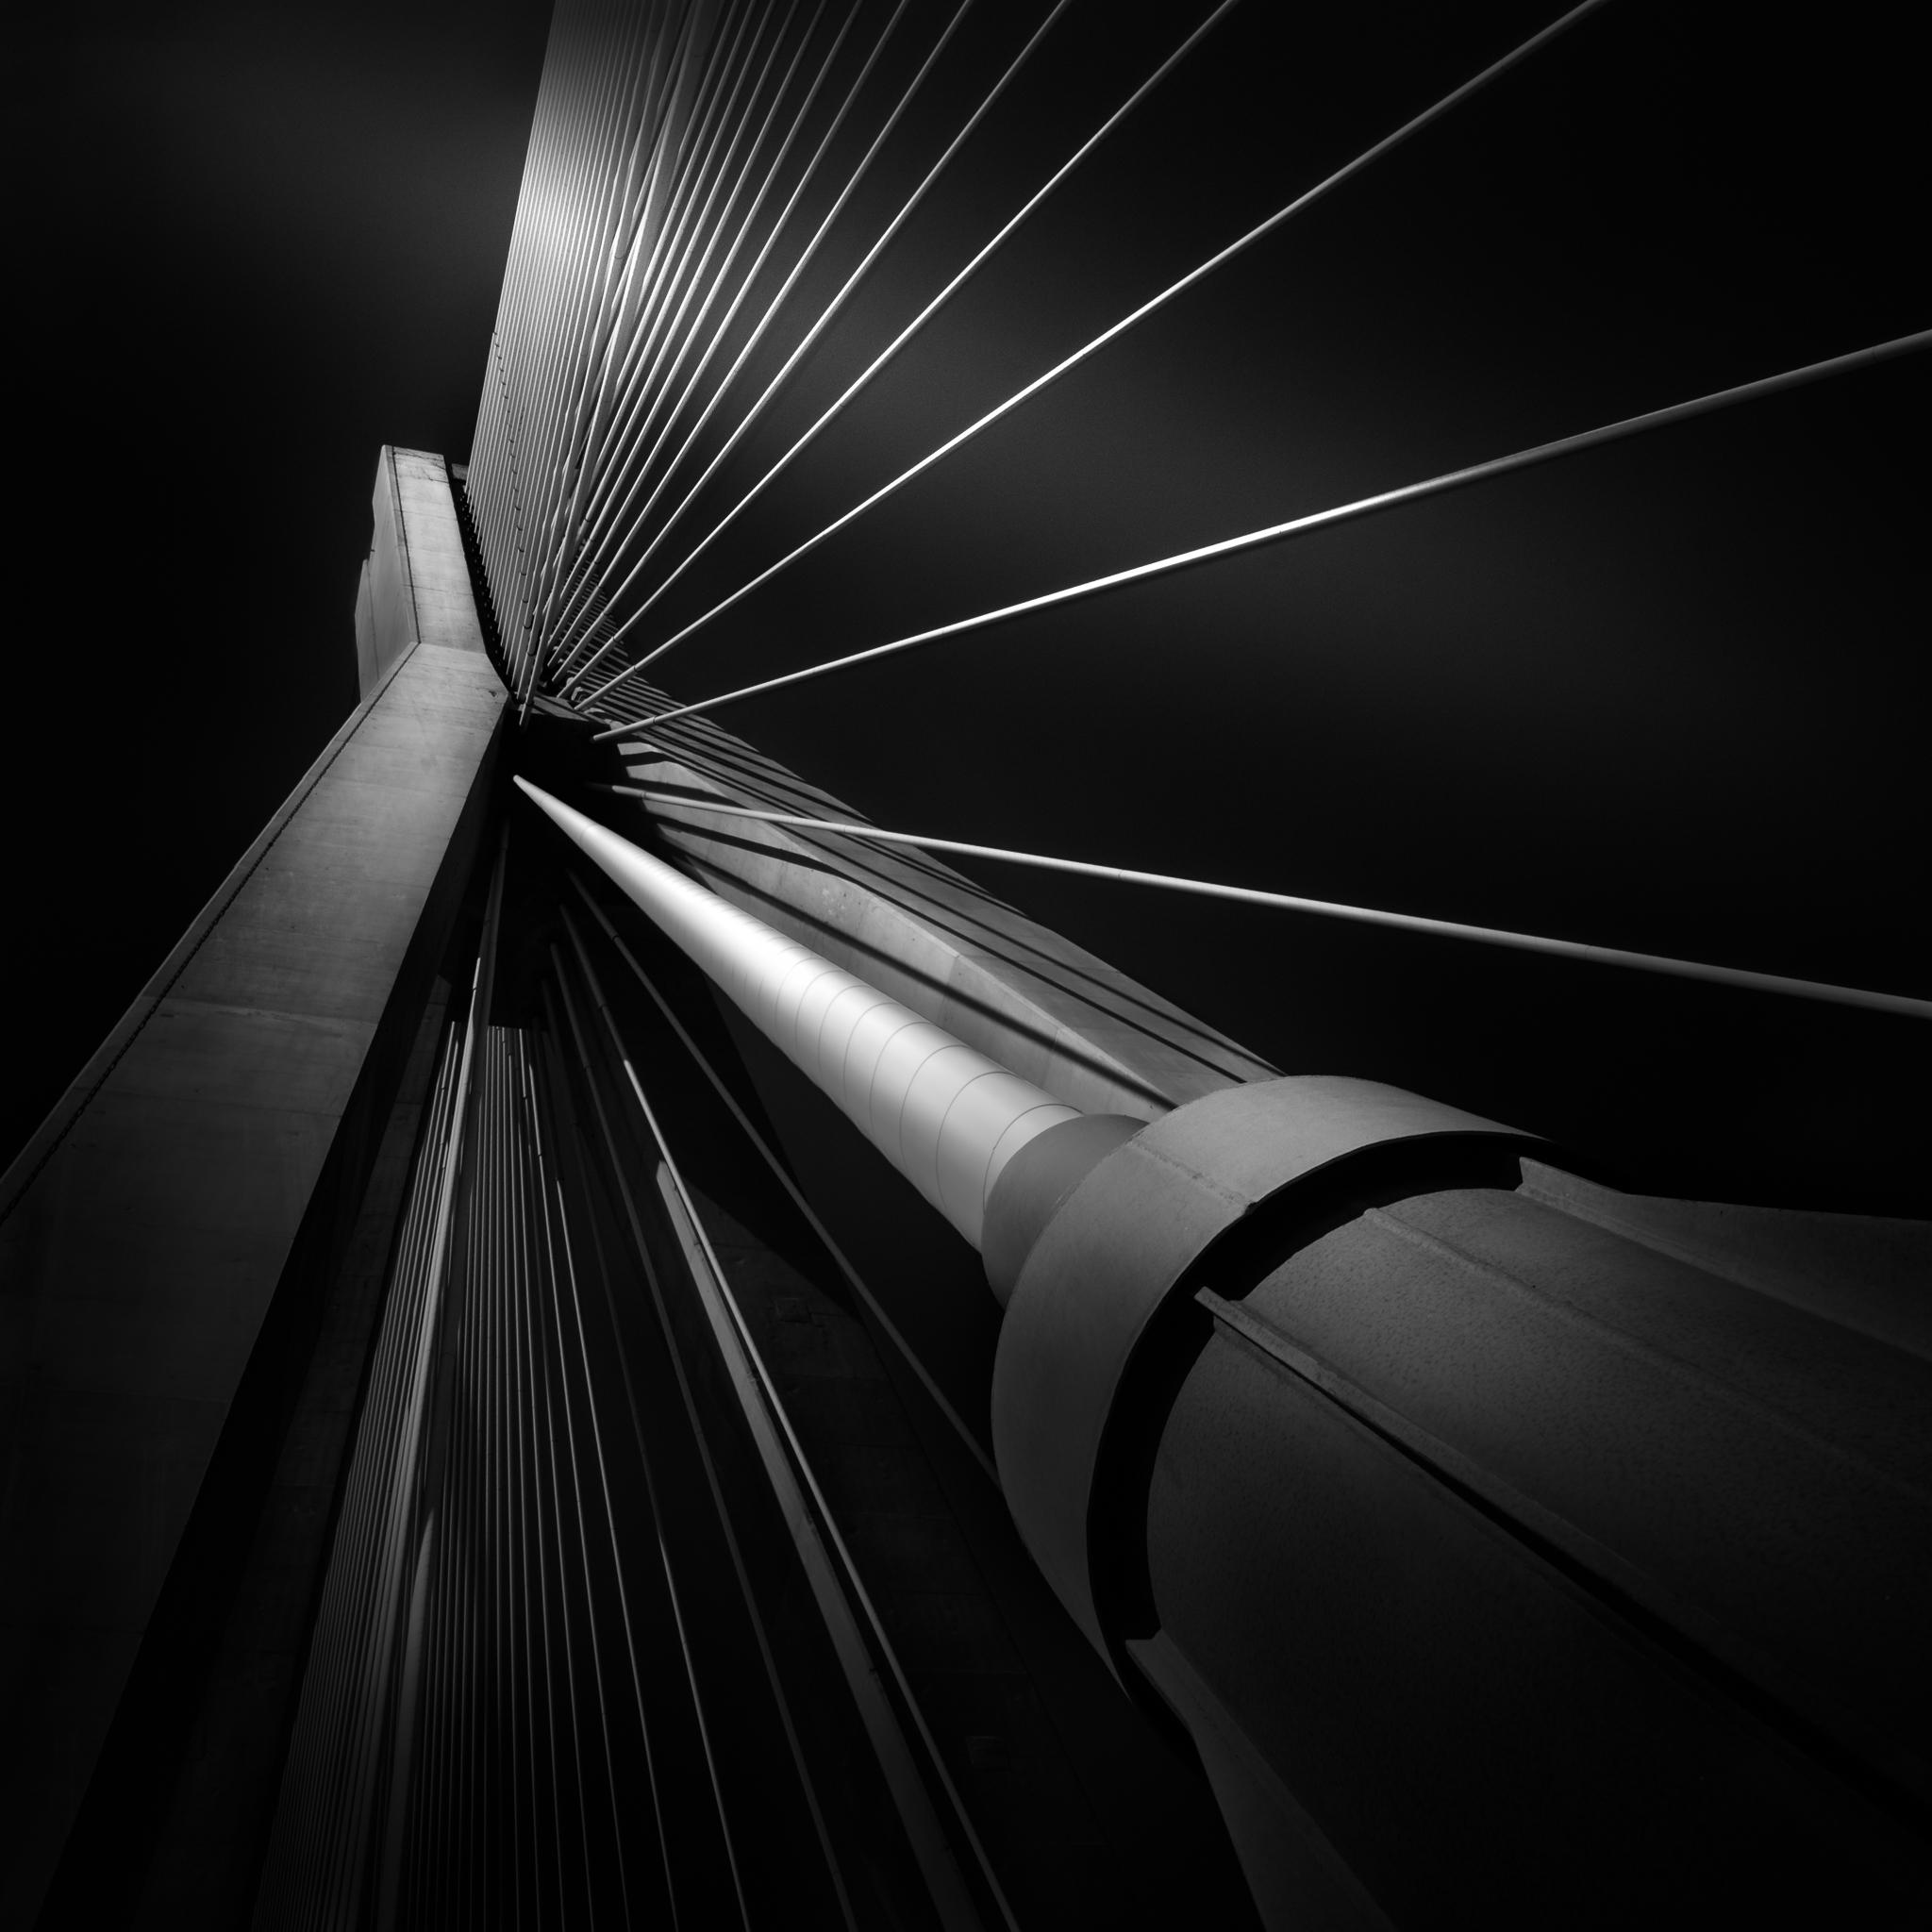 Julia Anna Gospodarou_03-Exuberance of Strings.jpg